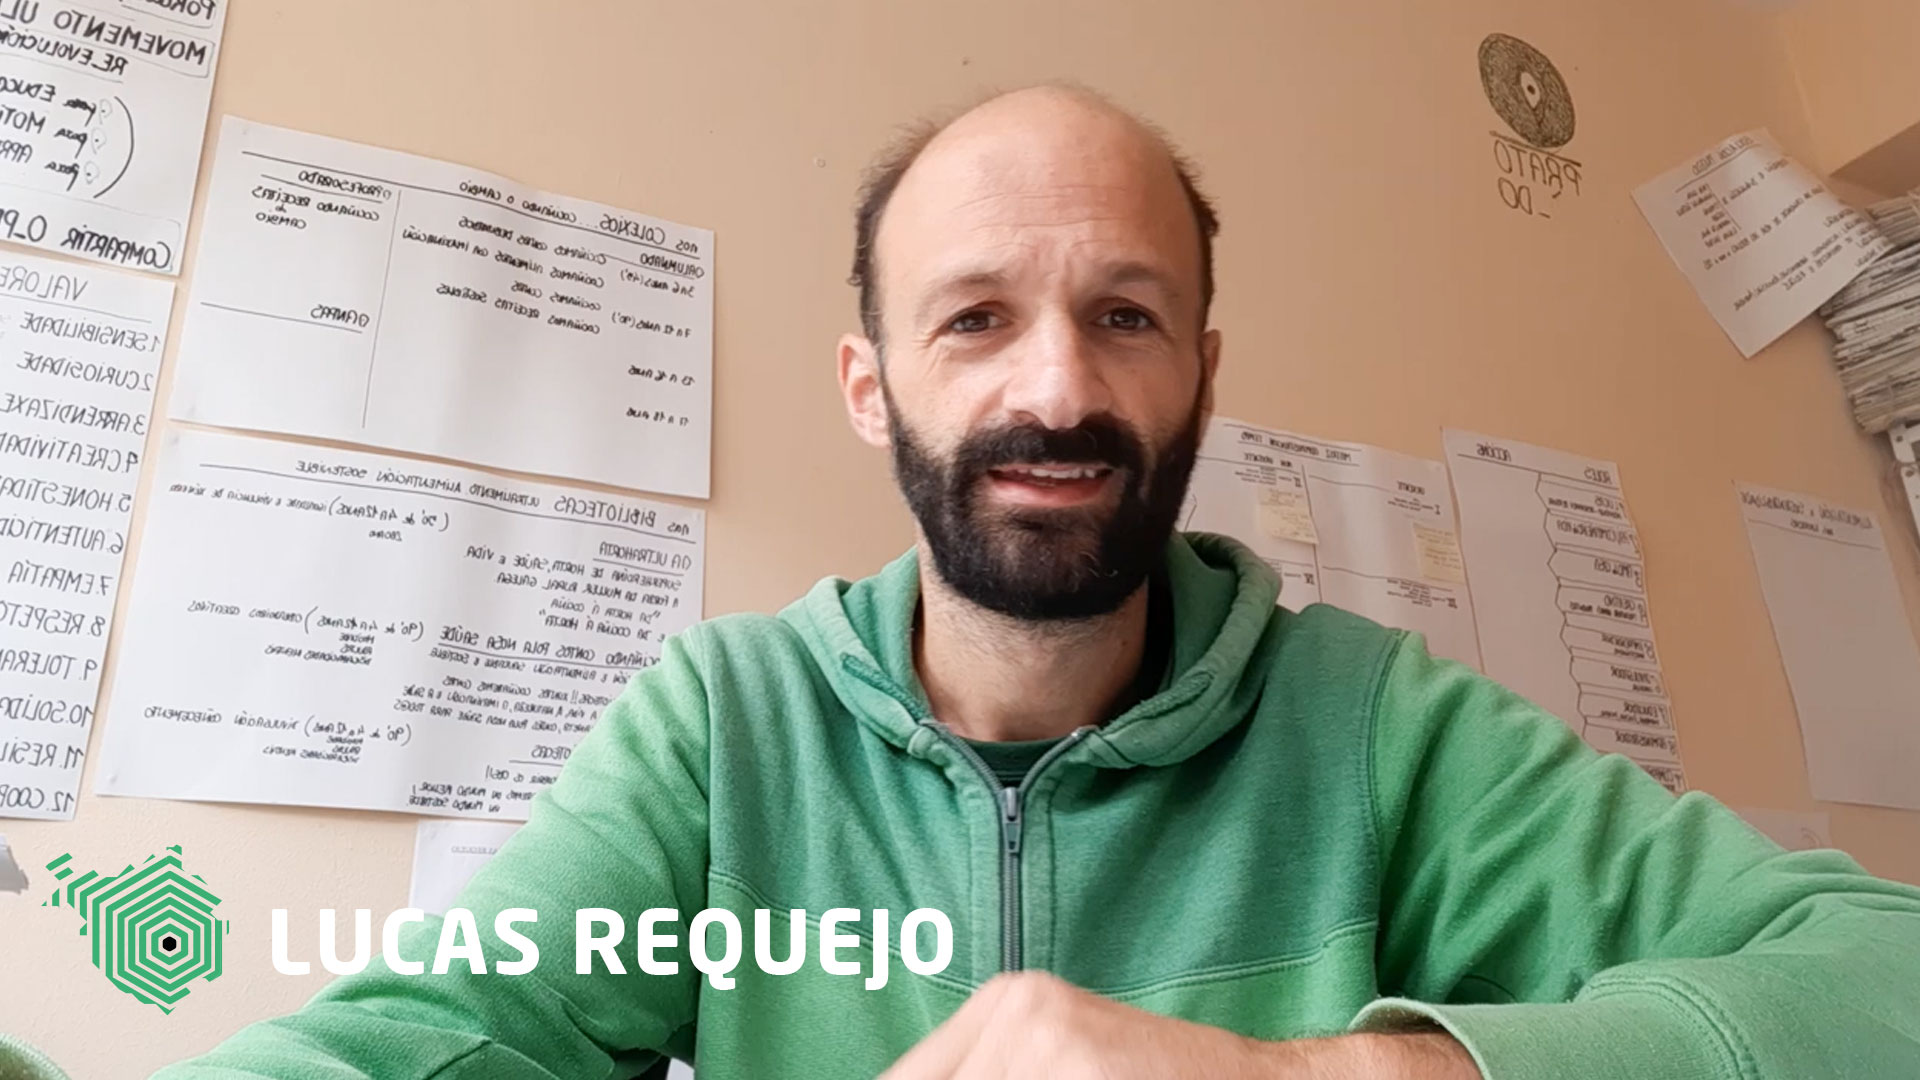 Lucas Requejo, mentor RR_dTerritrio